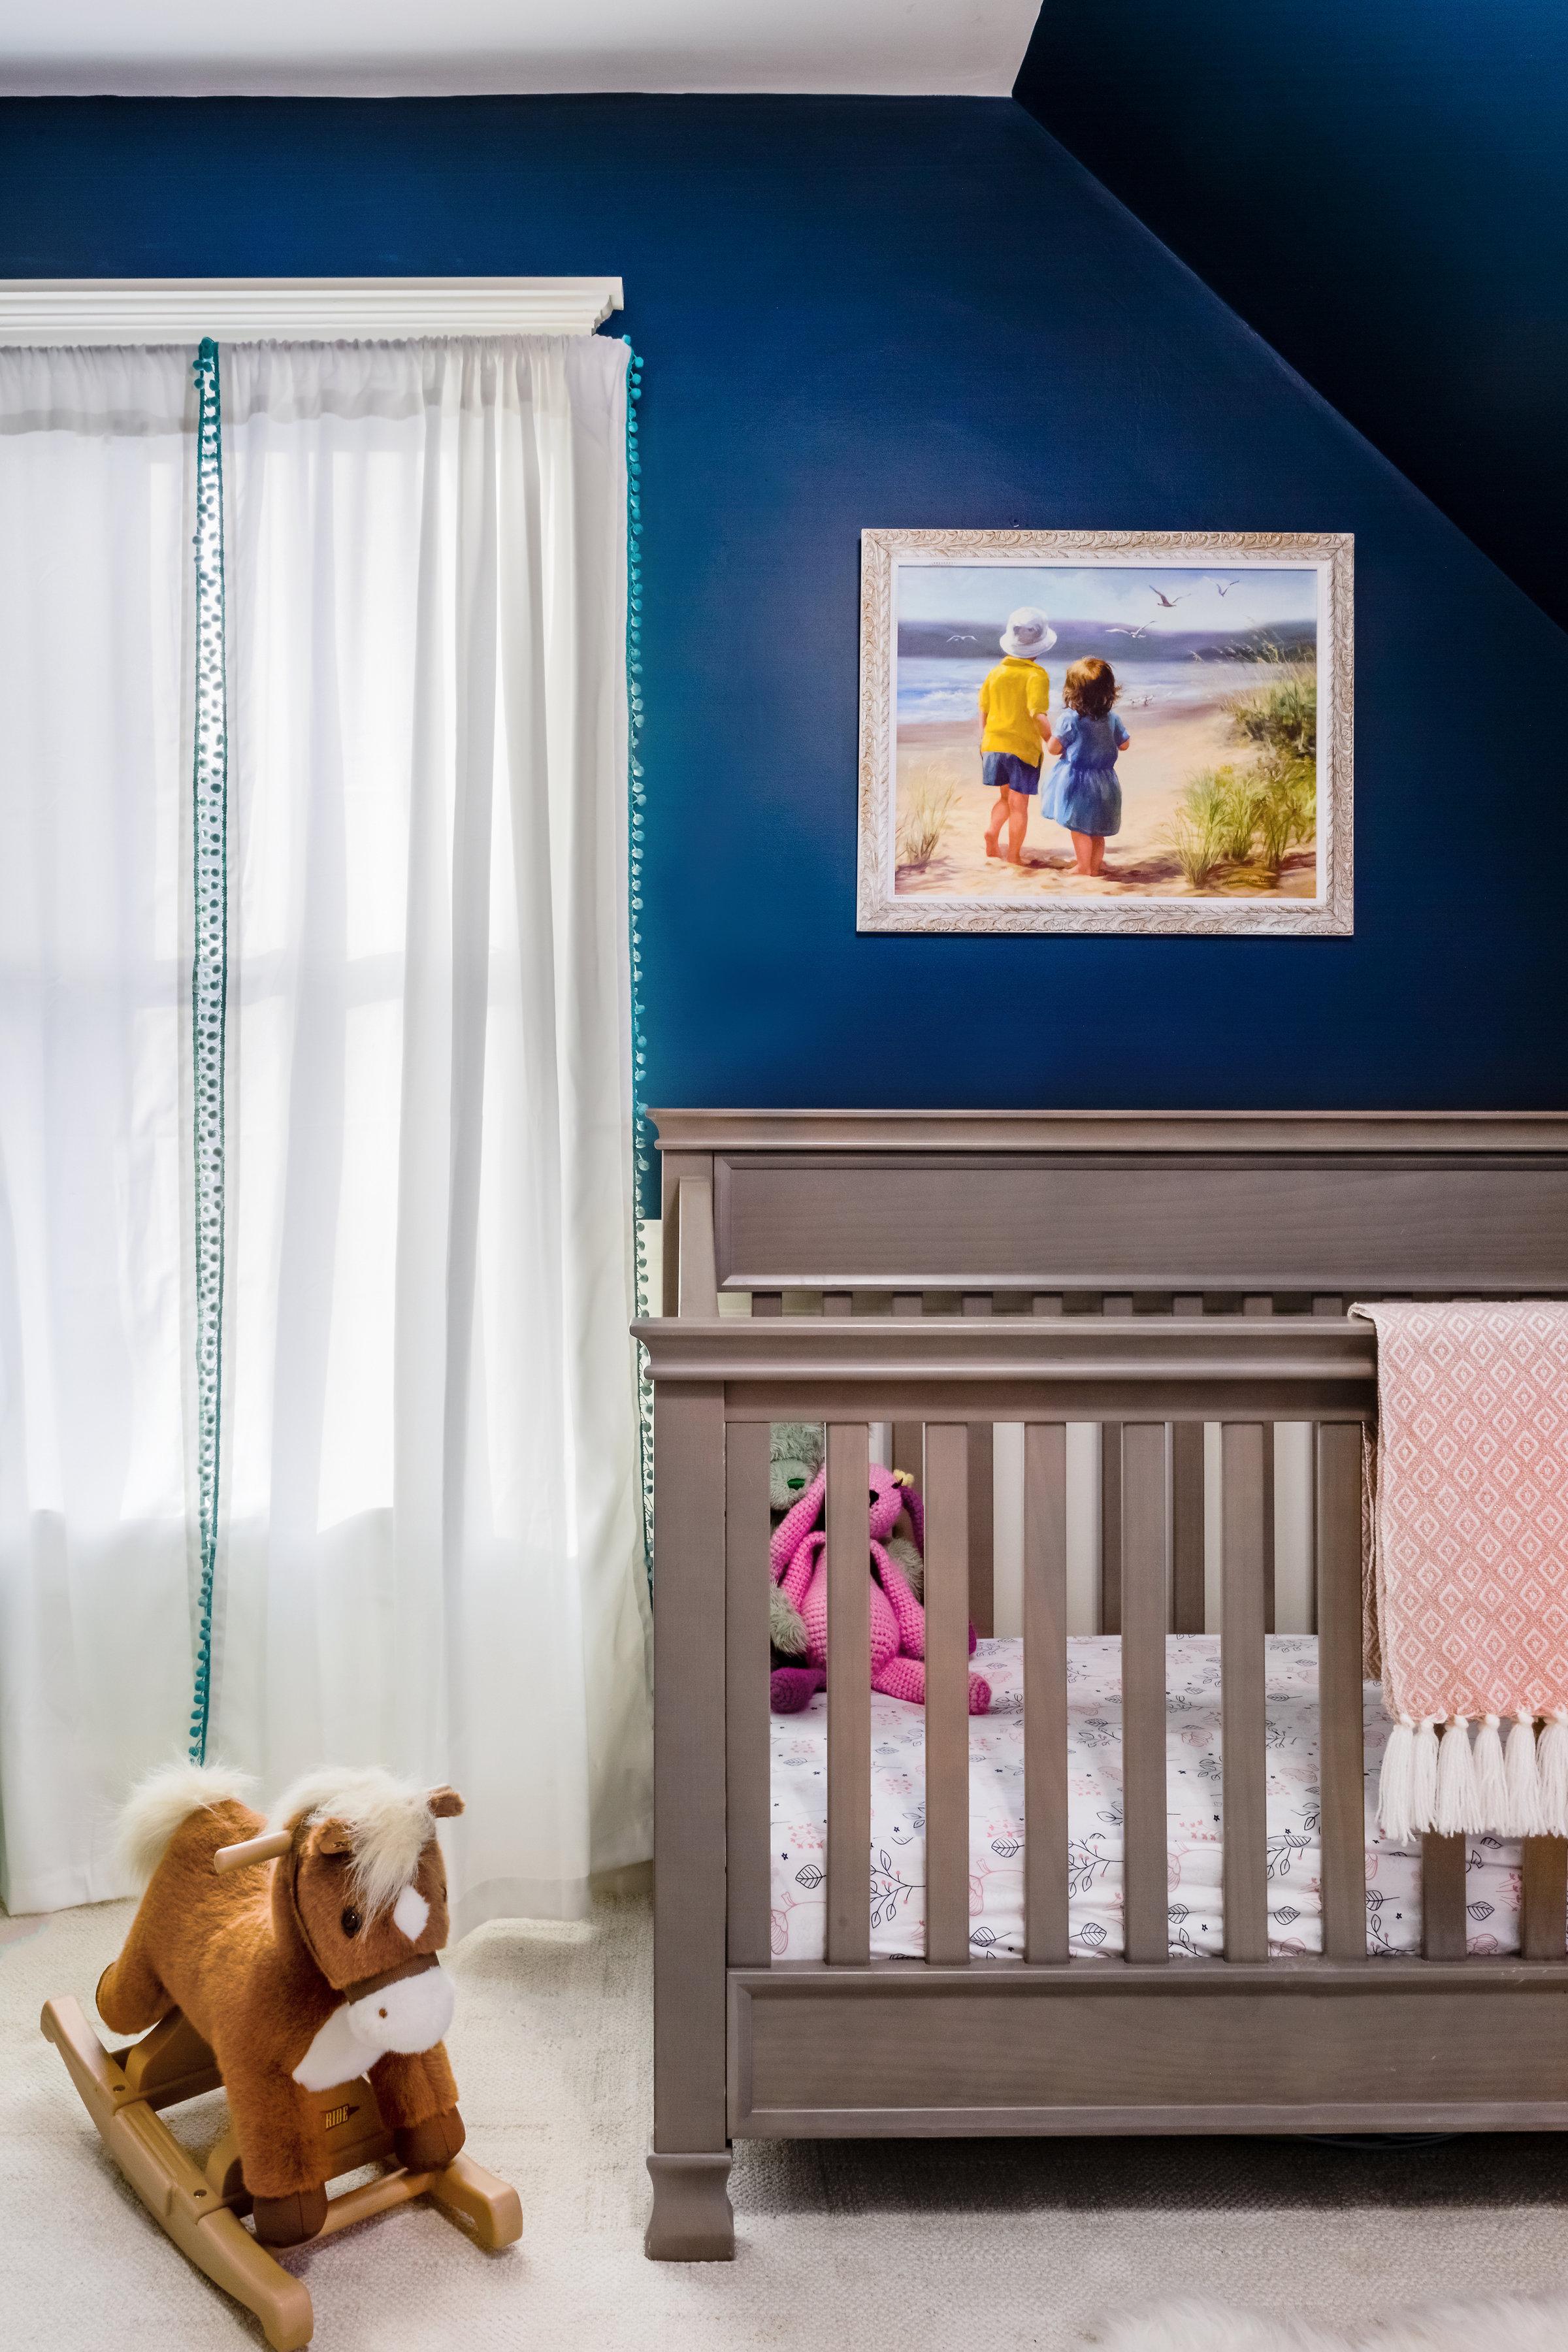 Boo & Rook bridgewater boston interior design traditional modern girl nursery design crib..jpg